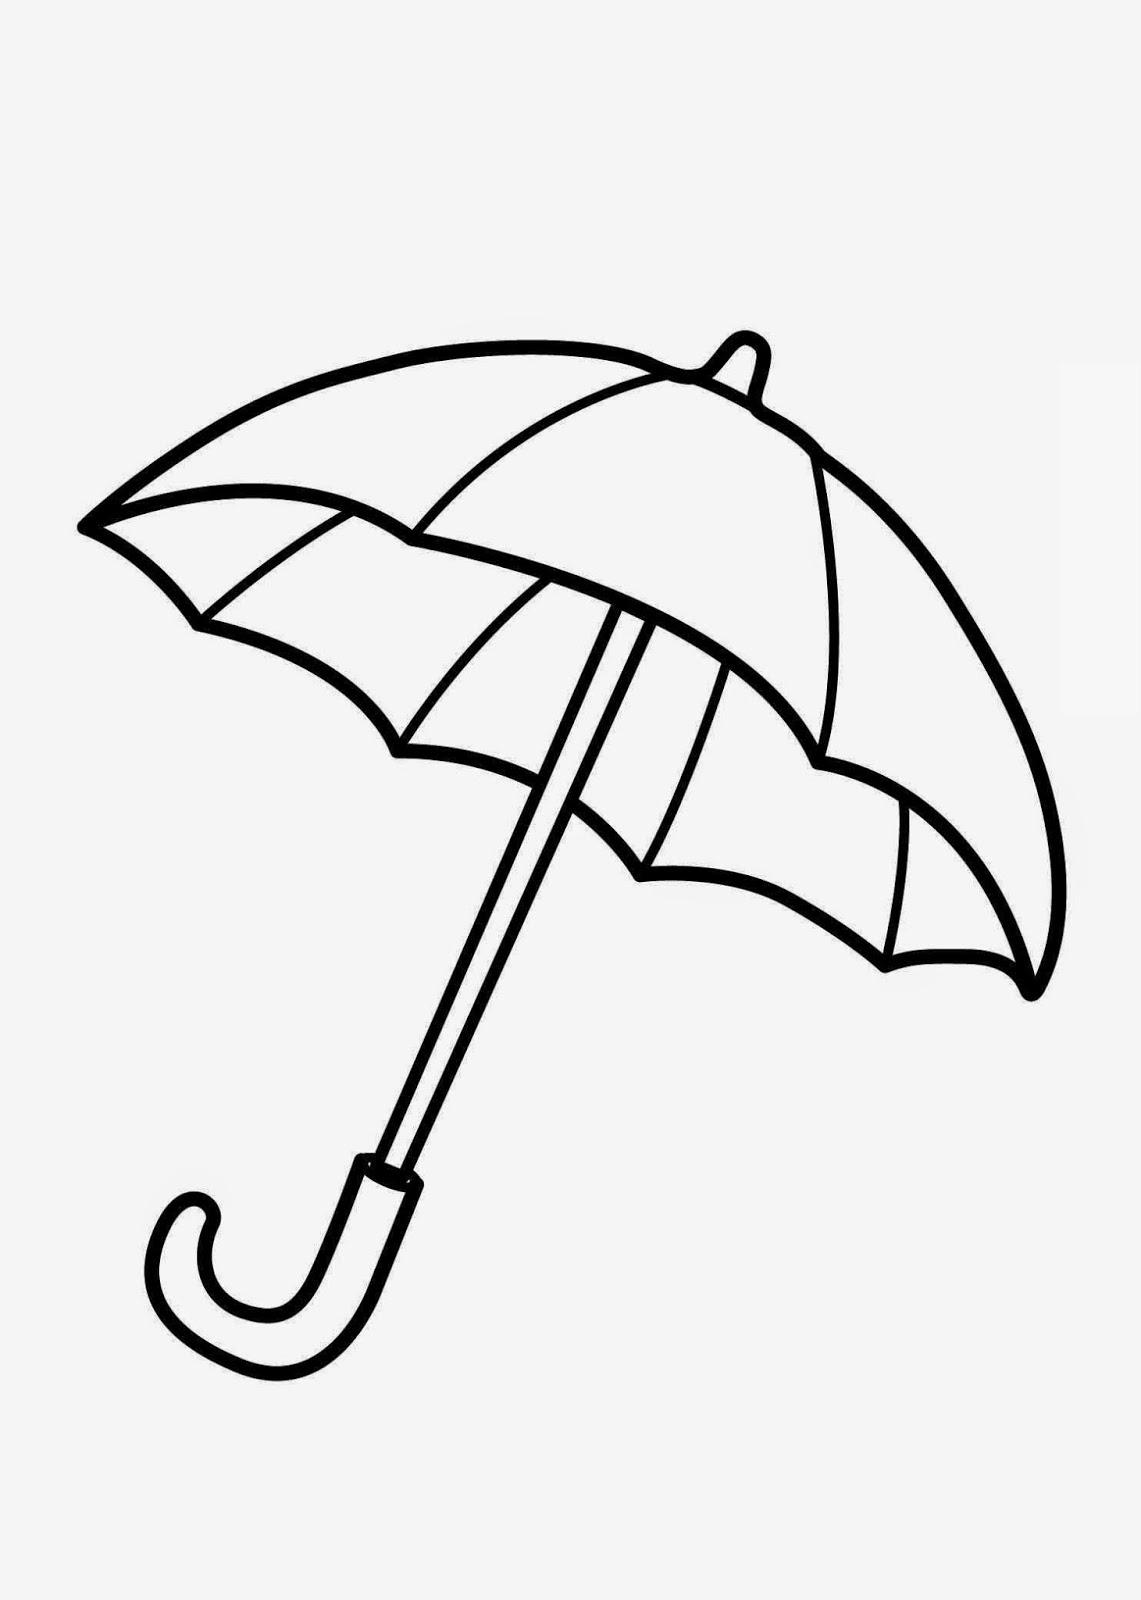 Free Printable Umbrella Coloring Pages Umbrella Coloring Page